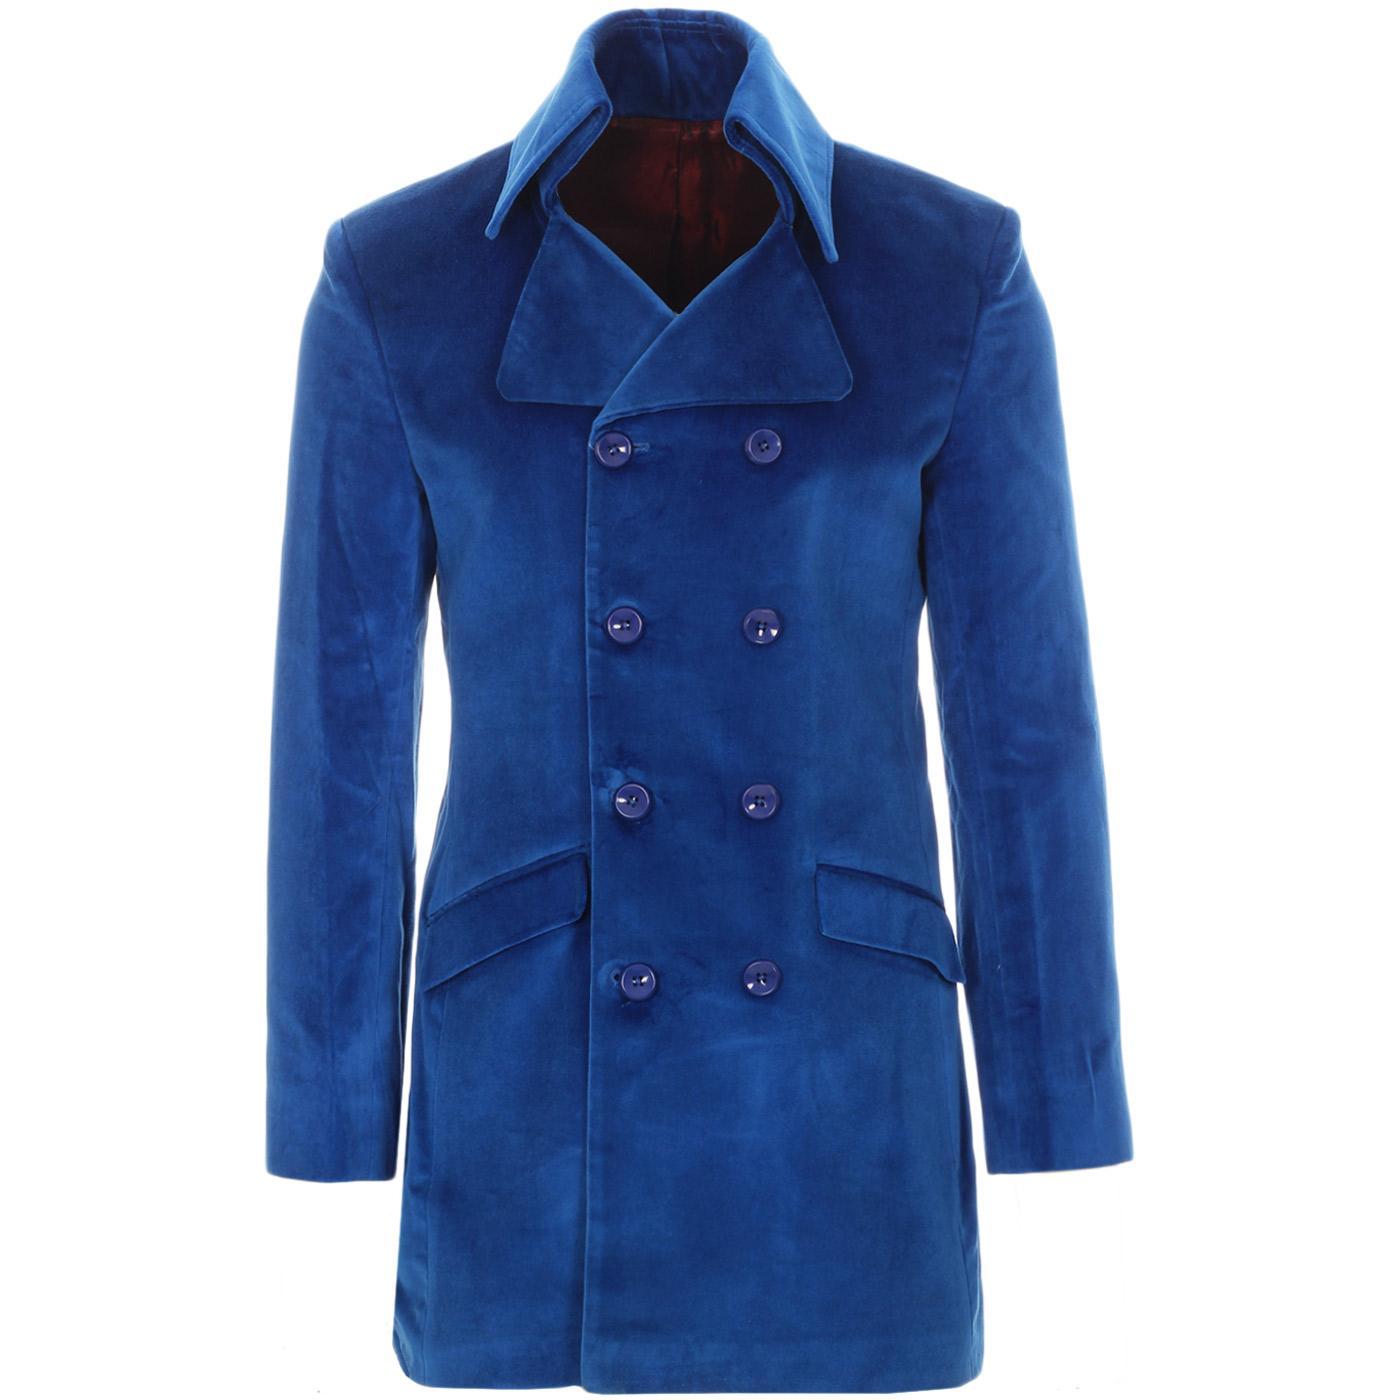 Velvet Goldmine MADCAP ENGLAND 60s Mod Jacket (RB)